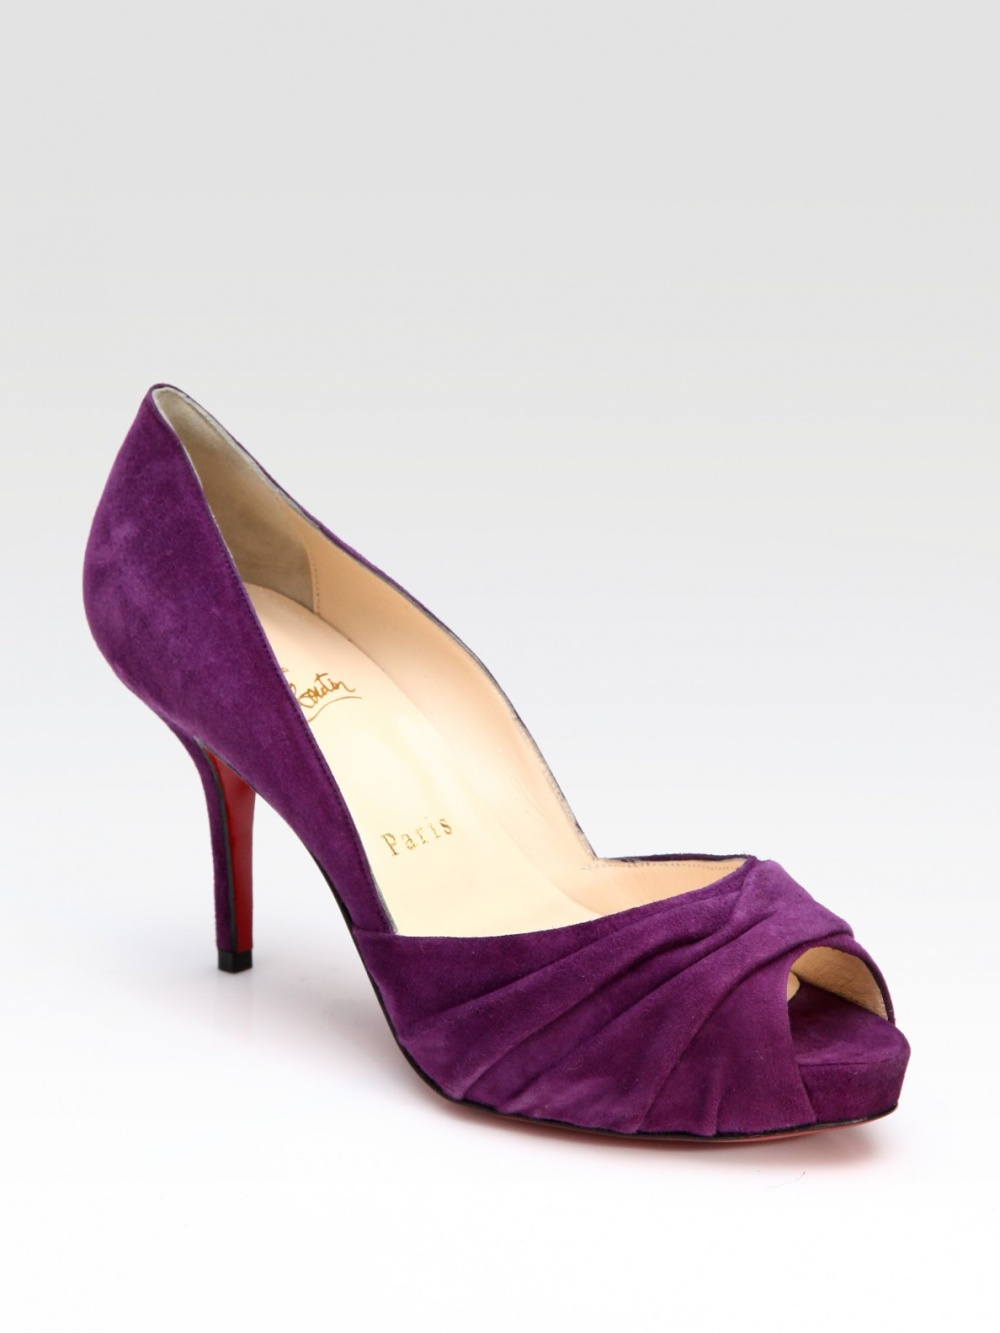 Туфли Christian Louboutin, 38 размер